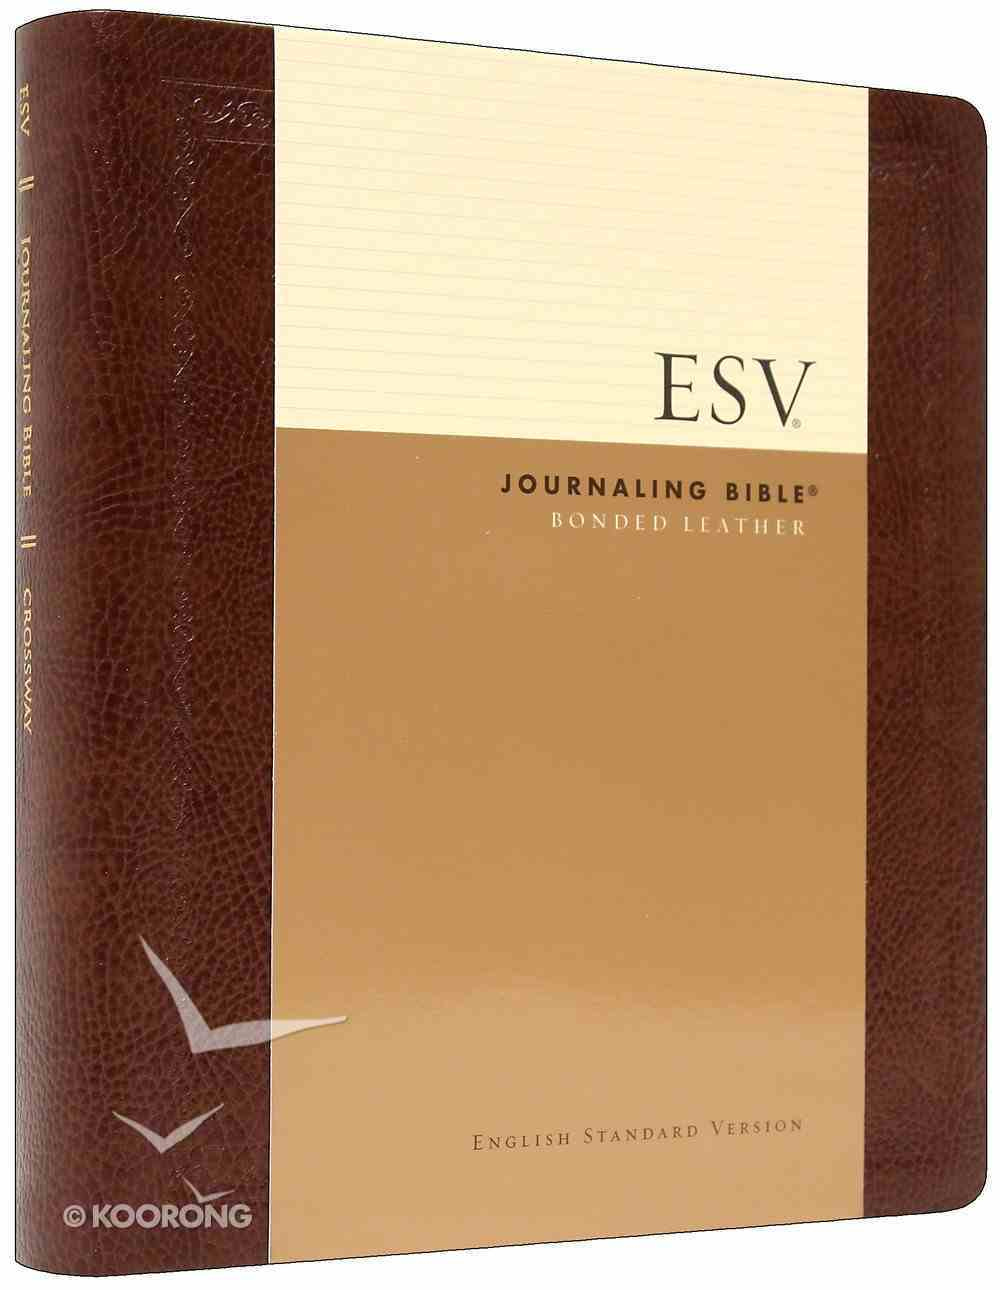 ESV Journaling Bible Mocha Threshold (Black Letter Edition) Bonded Leather